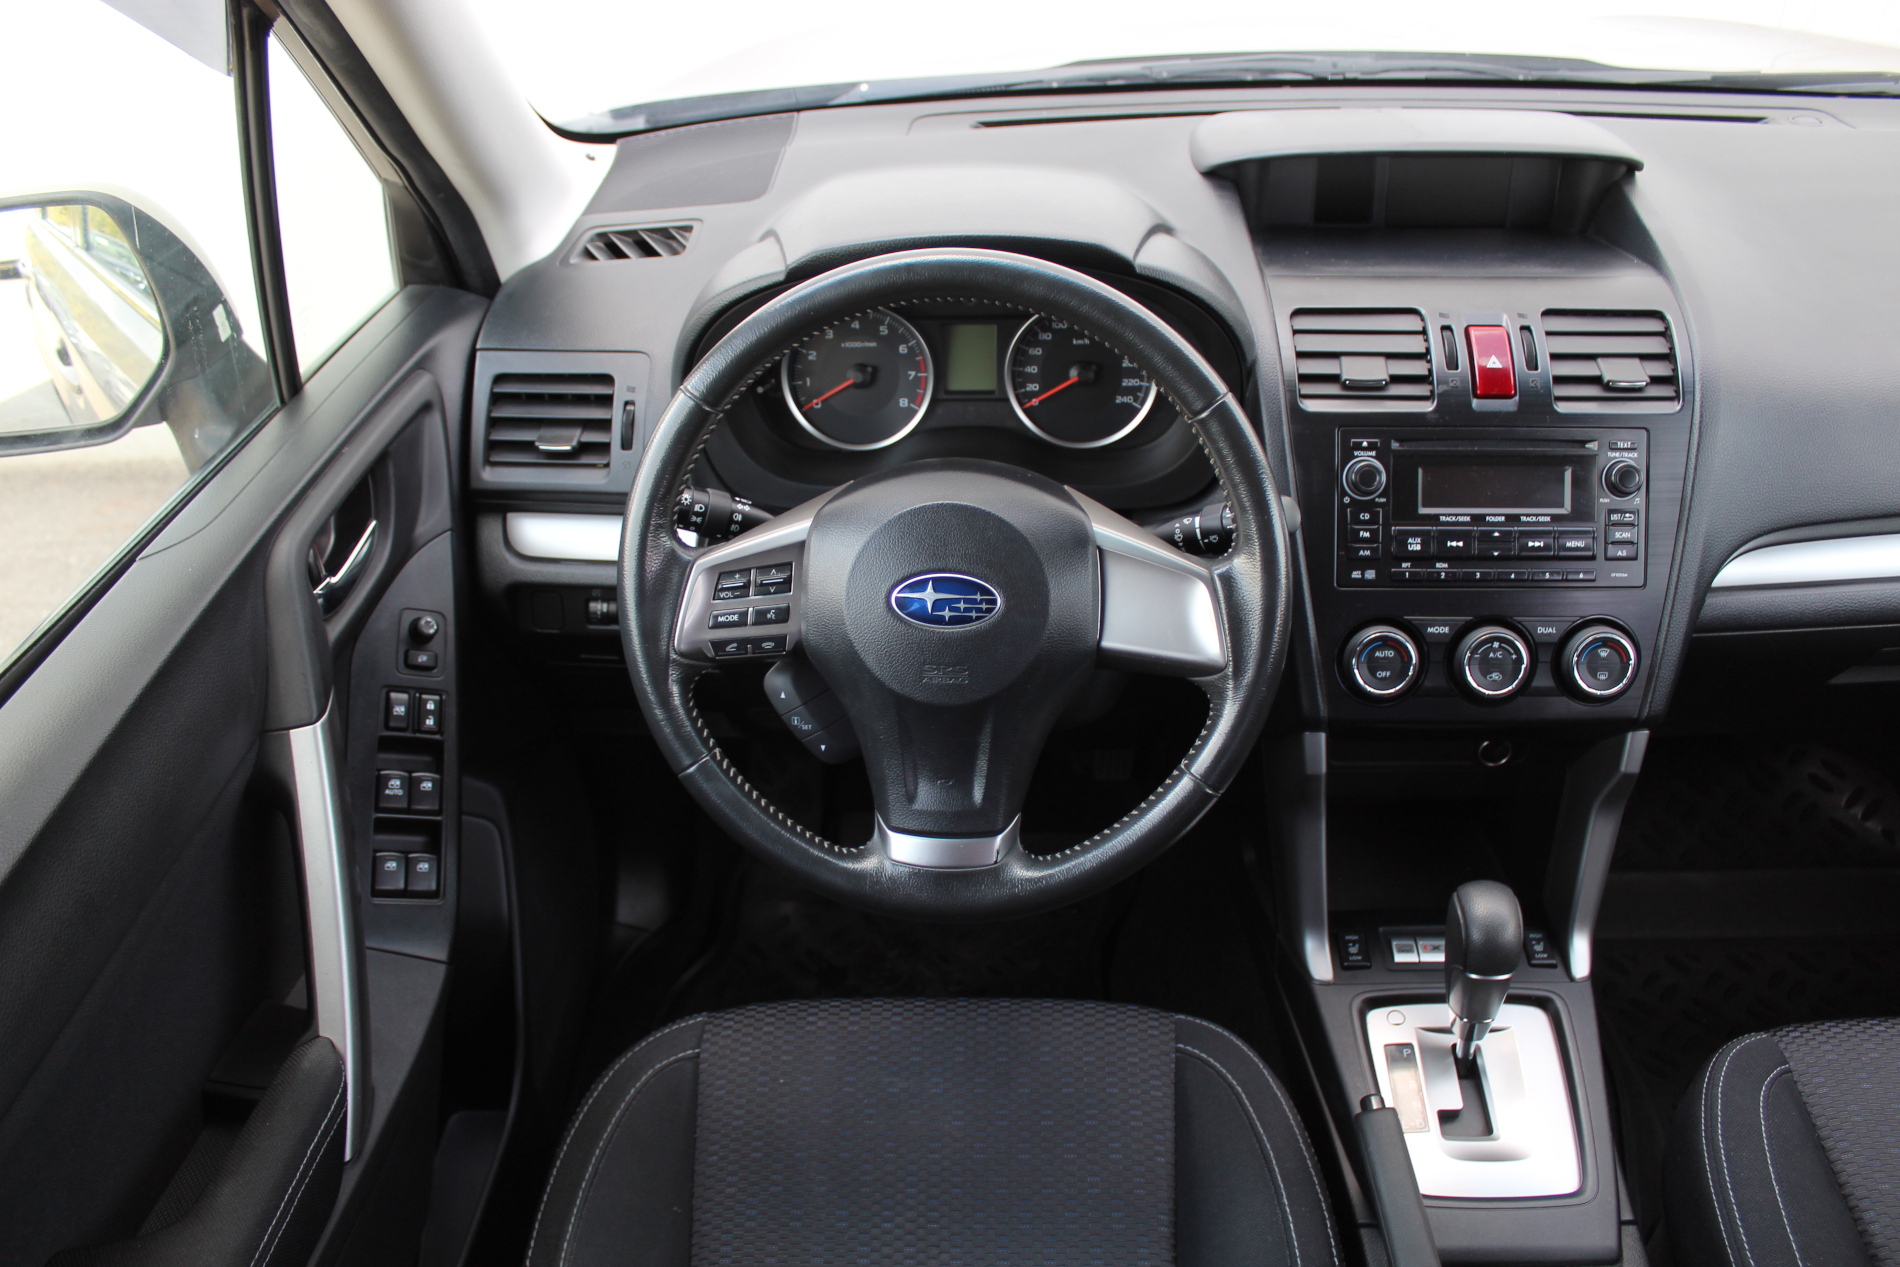 Subaru Forester Внедорожник (2014г.)